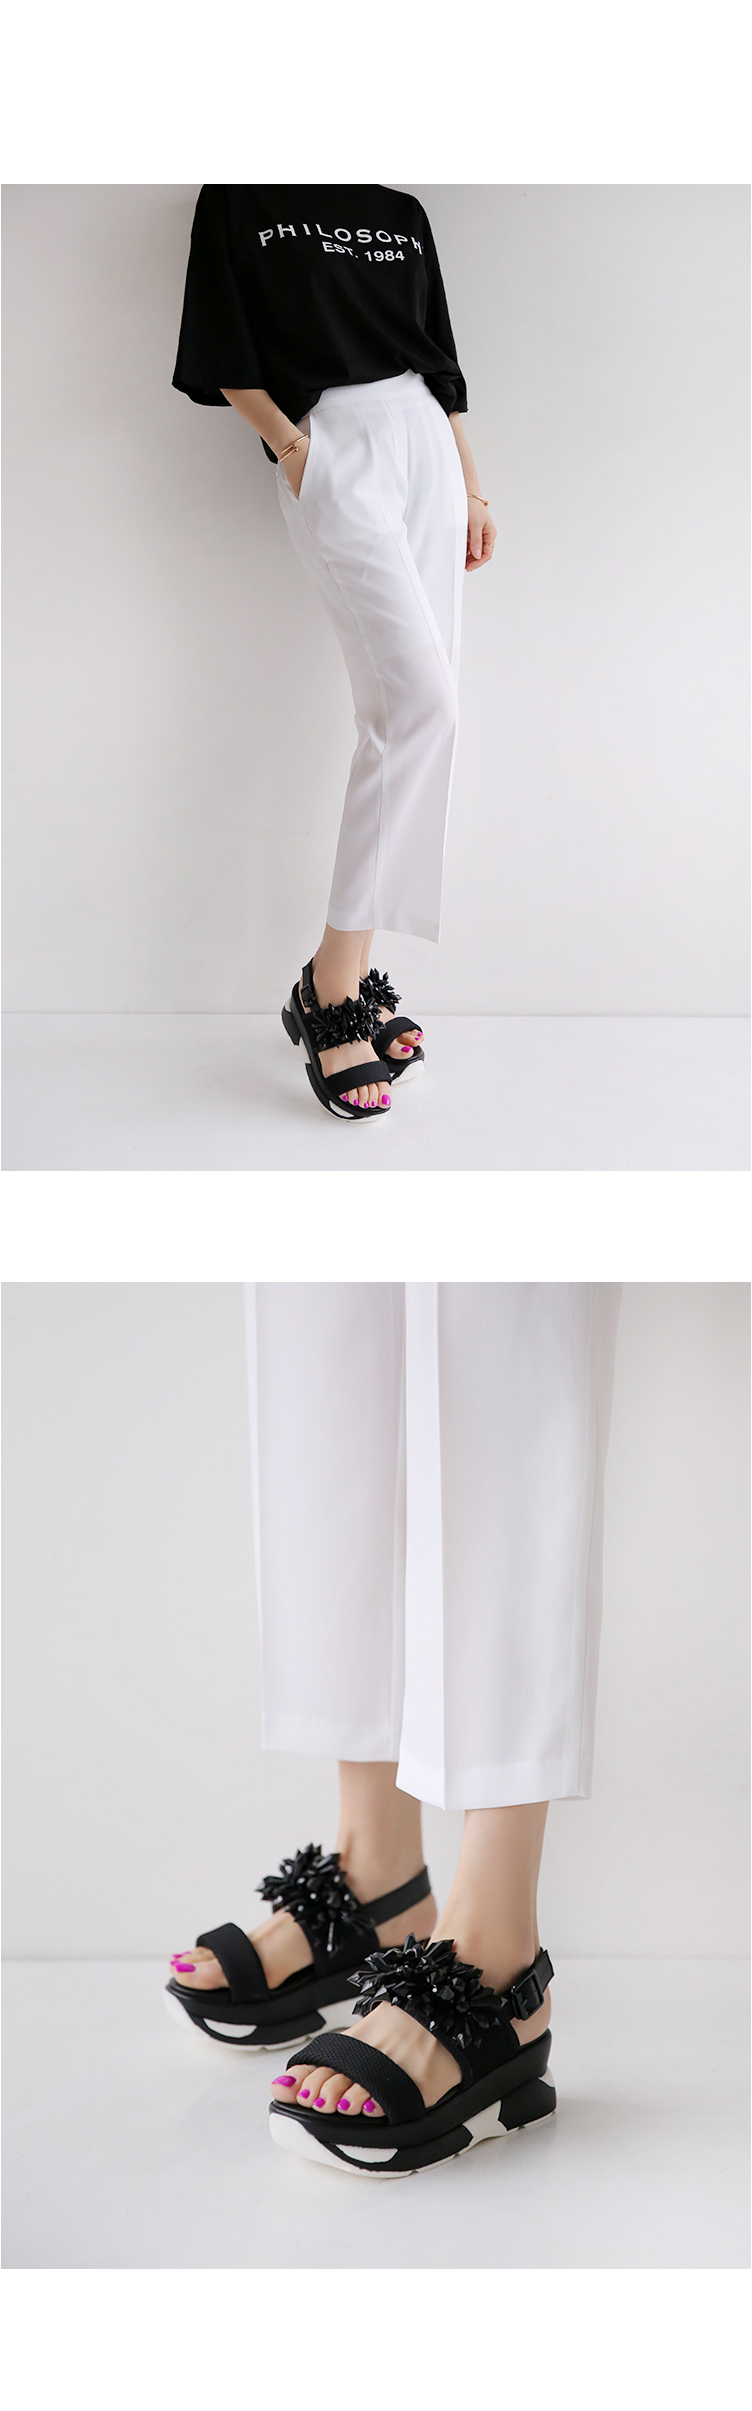 Revels 6cm